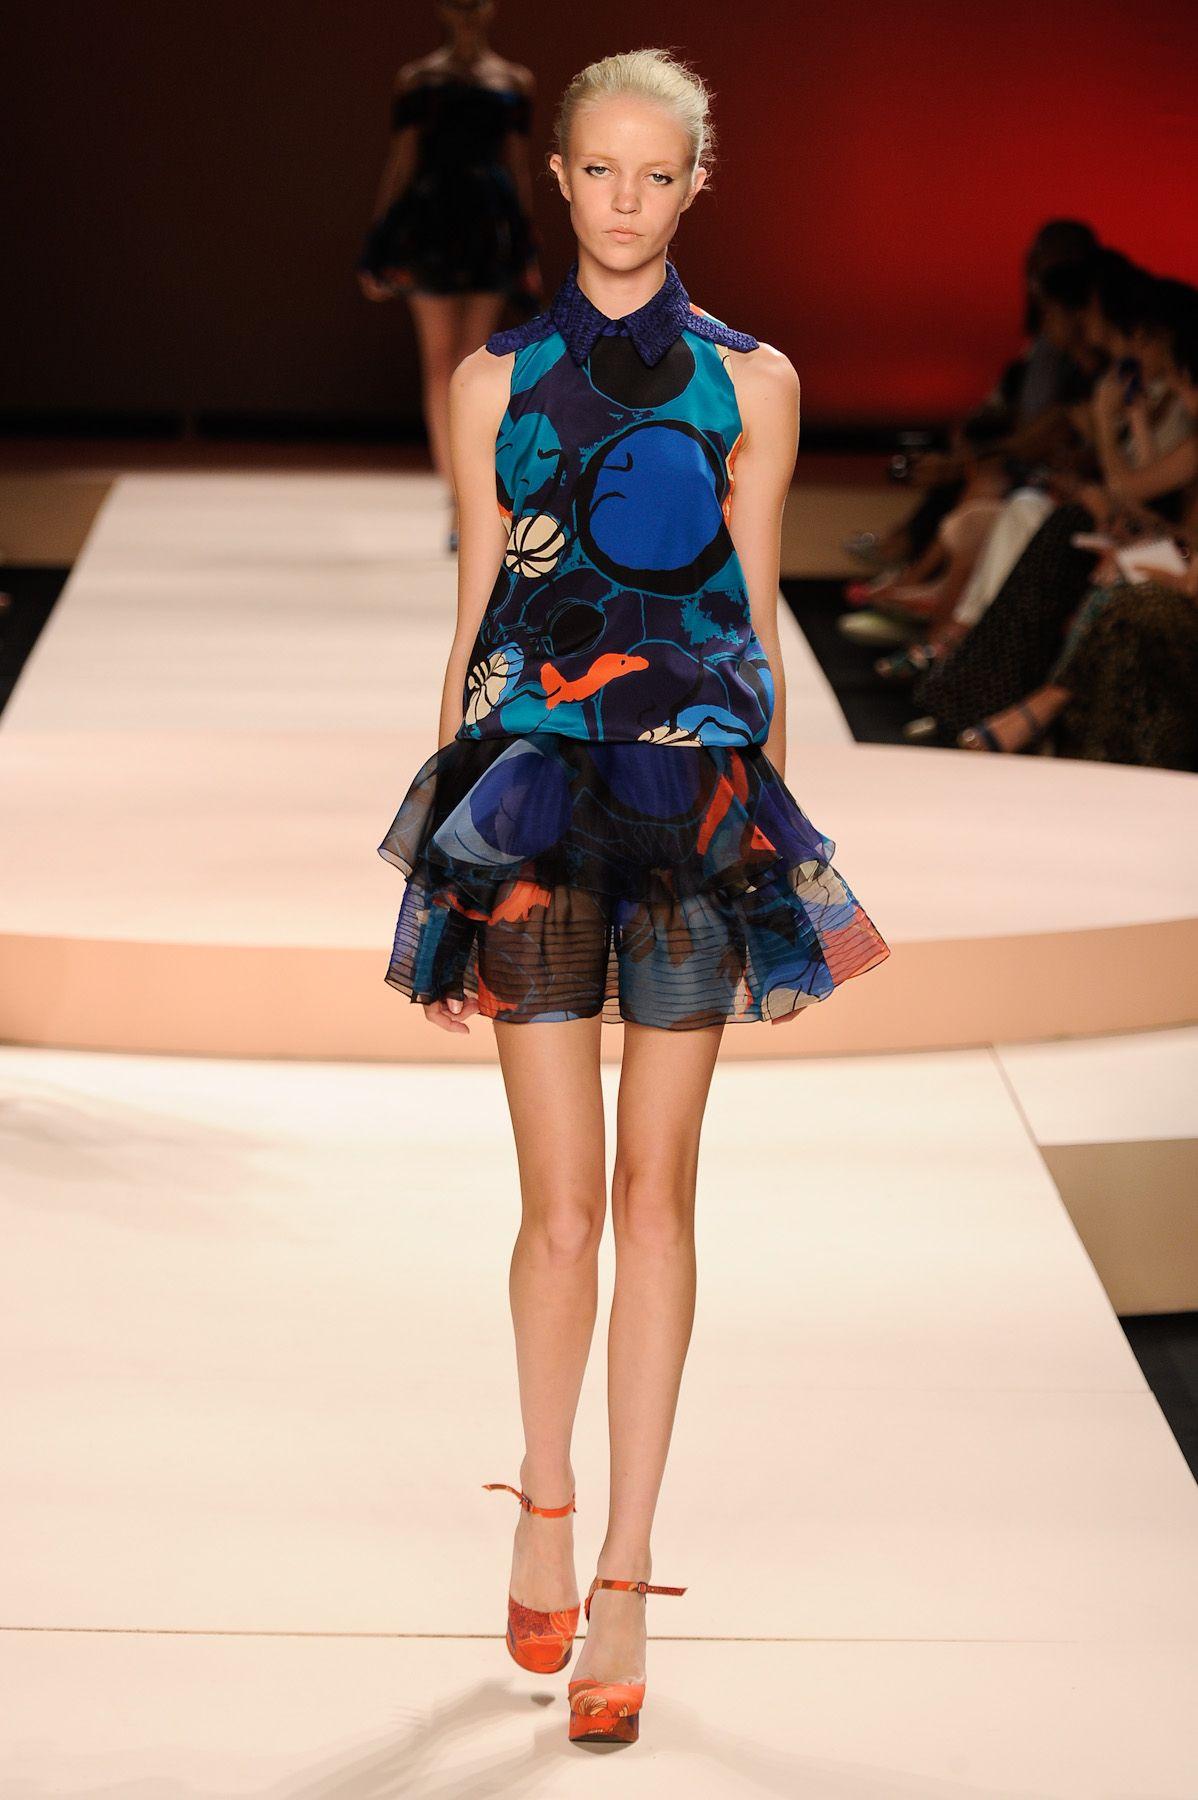 Fashion, Fashion Center, Fashion Looks